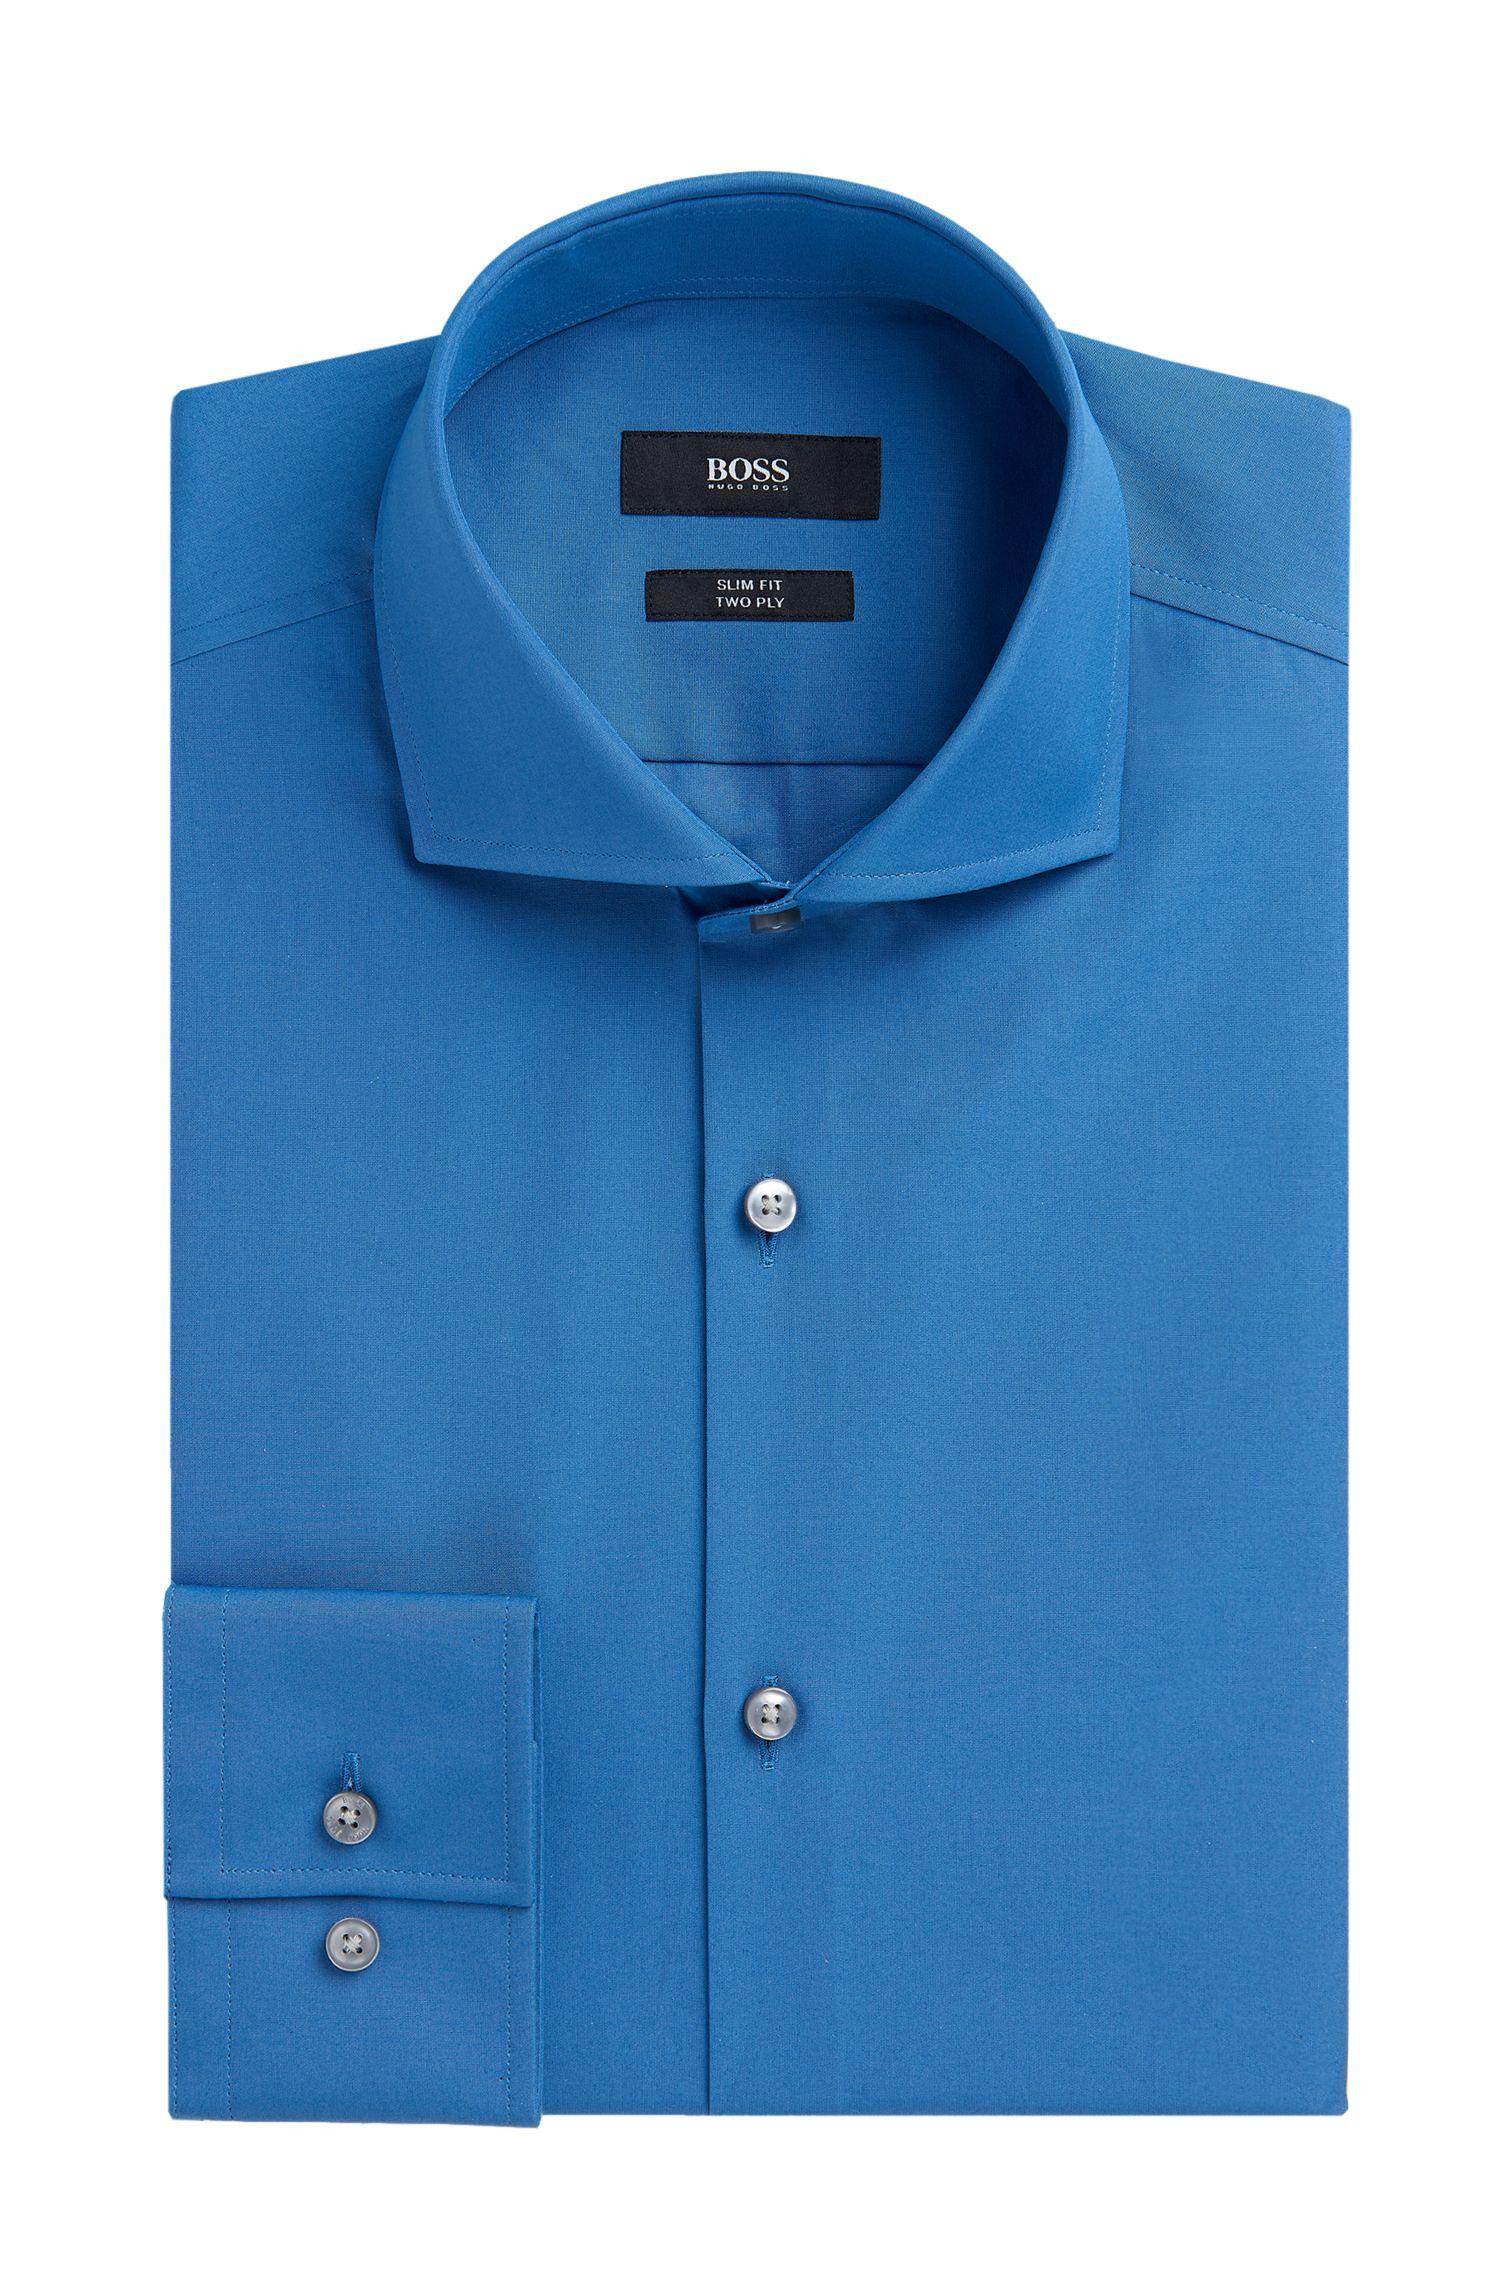 2-Ply Cotton Dress Shirt, Slim Fit | Jason